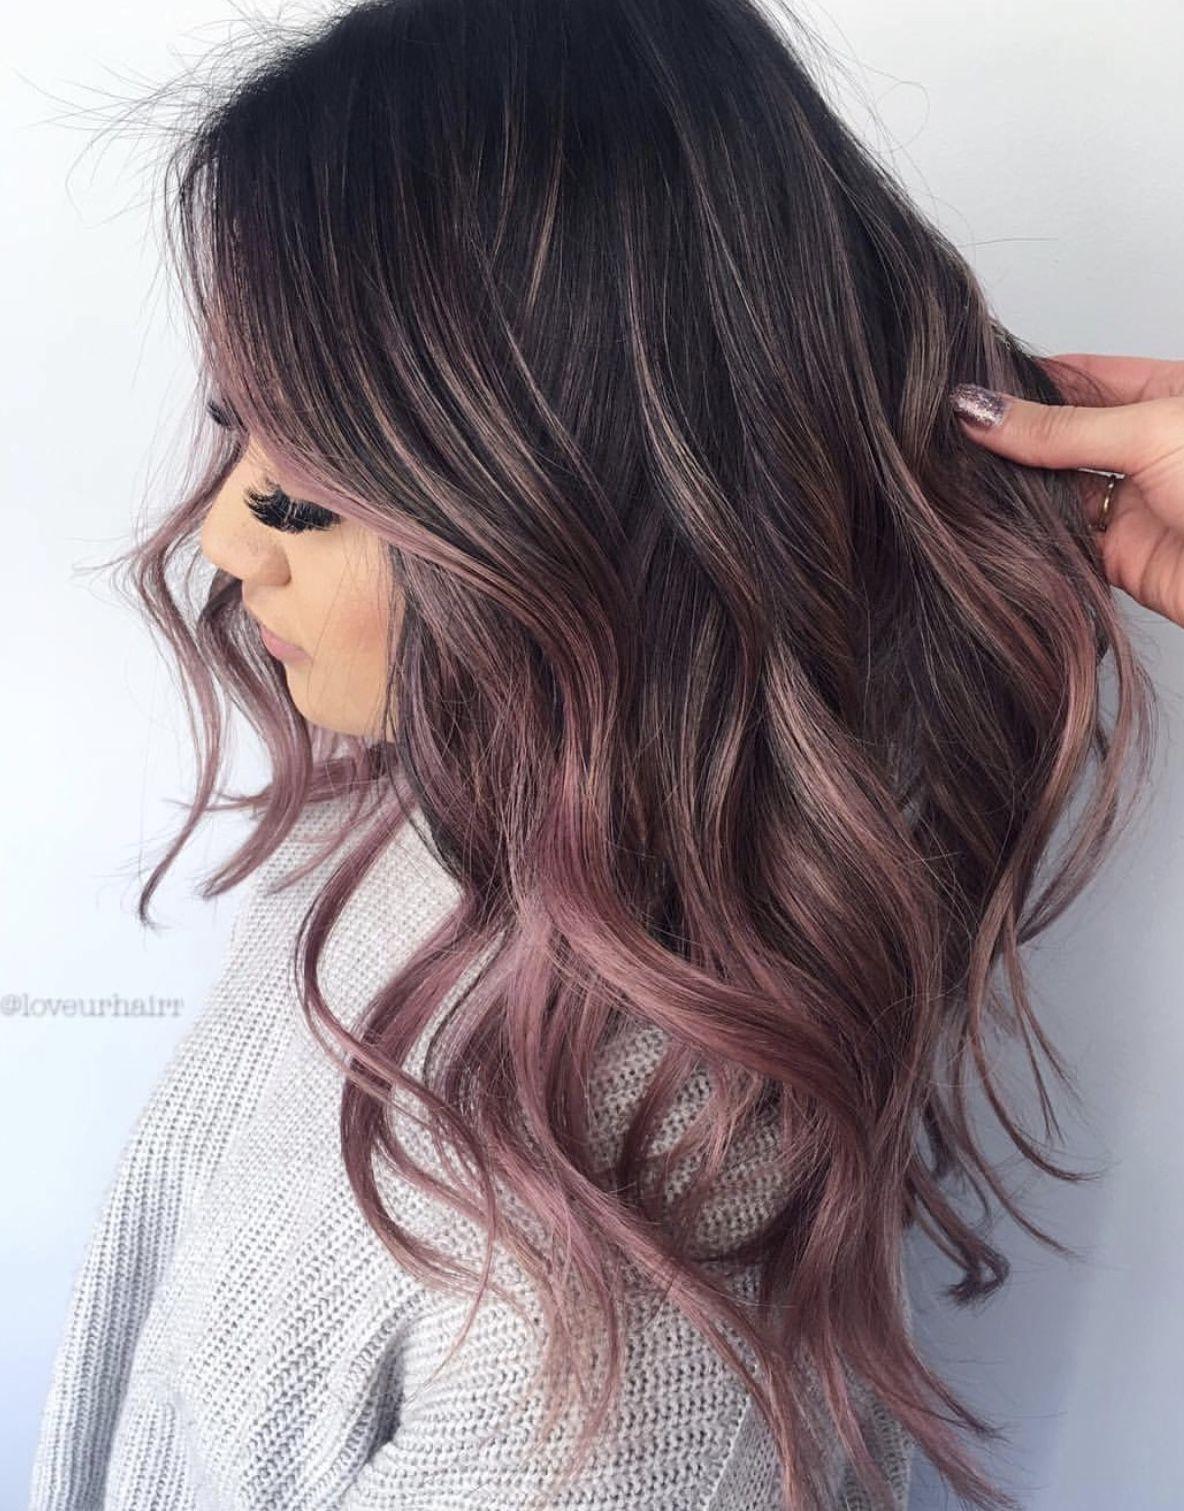 Pin By Hailey On Beauty Blackberry Hair Colour Hair Color For Fair Skin Hair Color Rose Gold